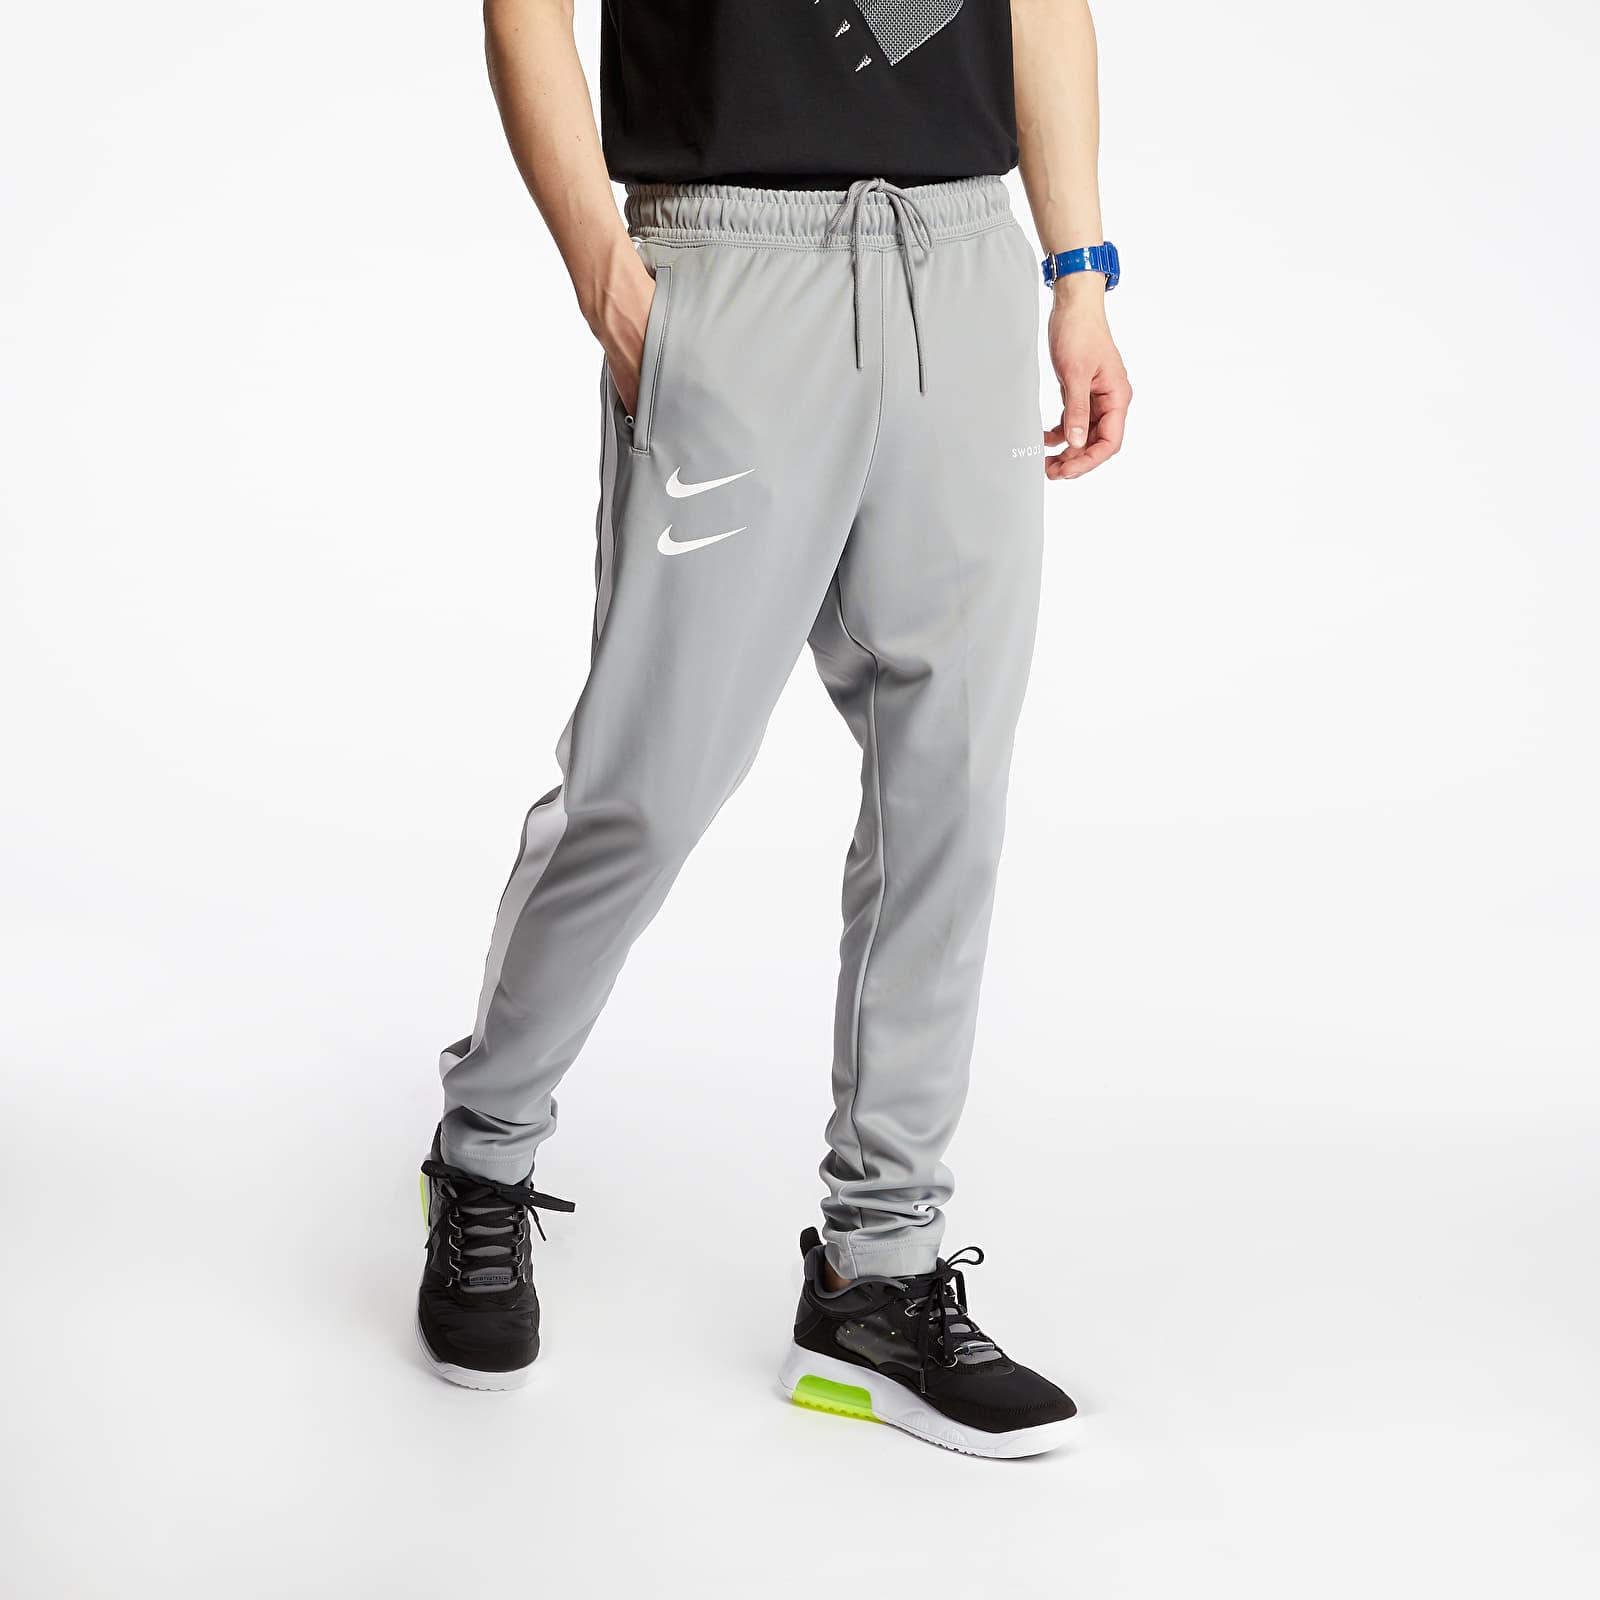 Pants and jeans Nike Sportswear Swoosh PK Pants Particle Grey/ White/ Black/ White